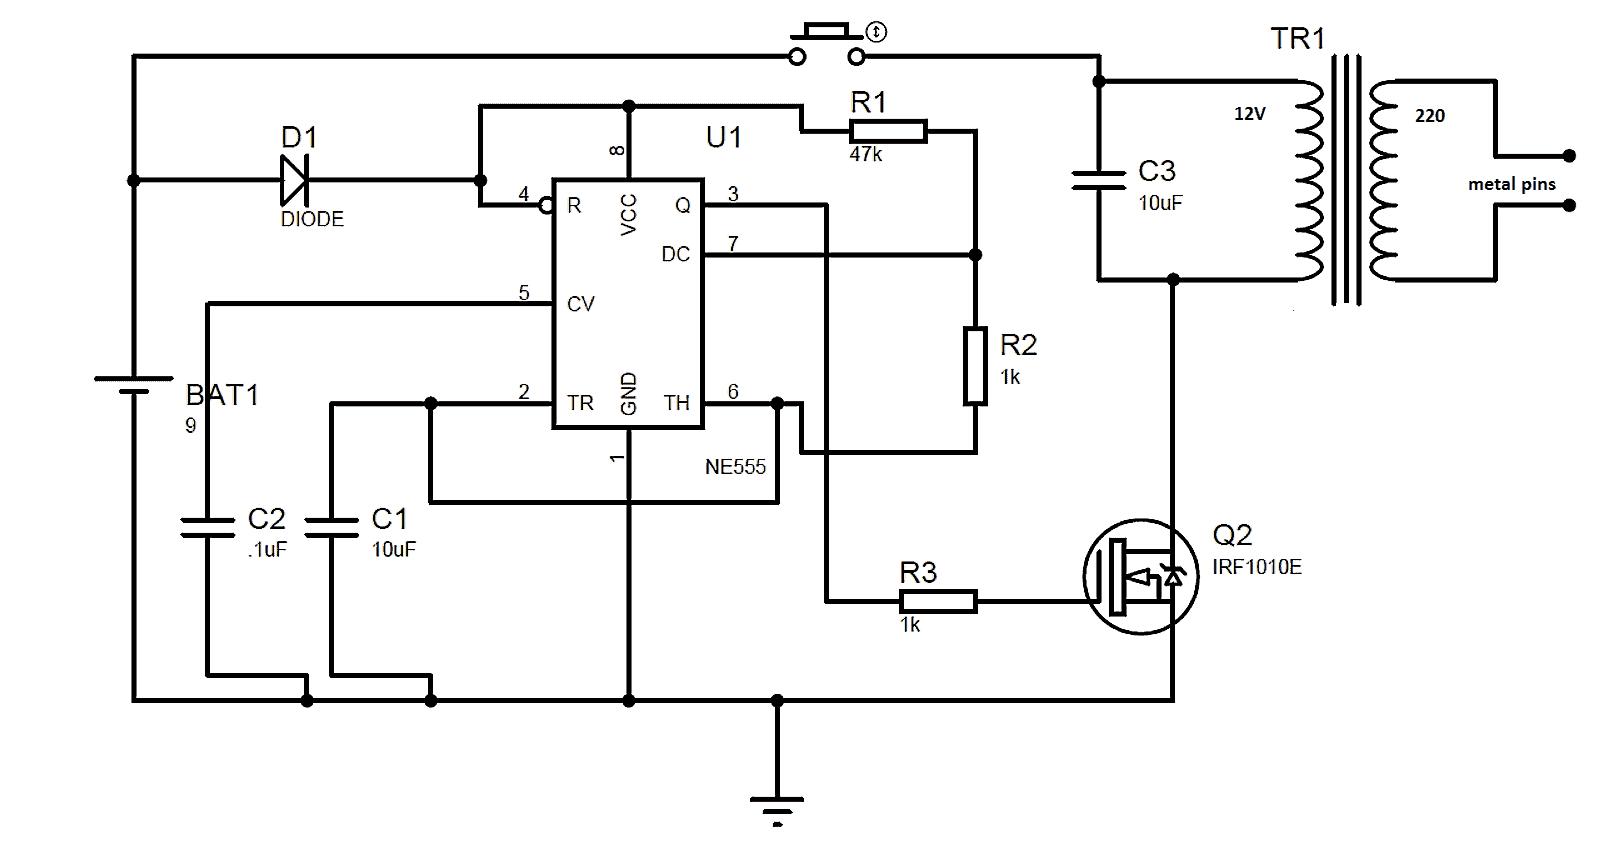 Lm555 Timer Circuit Diagram Arduino Uno Pin Diagram 555 Timer Ic